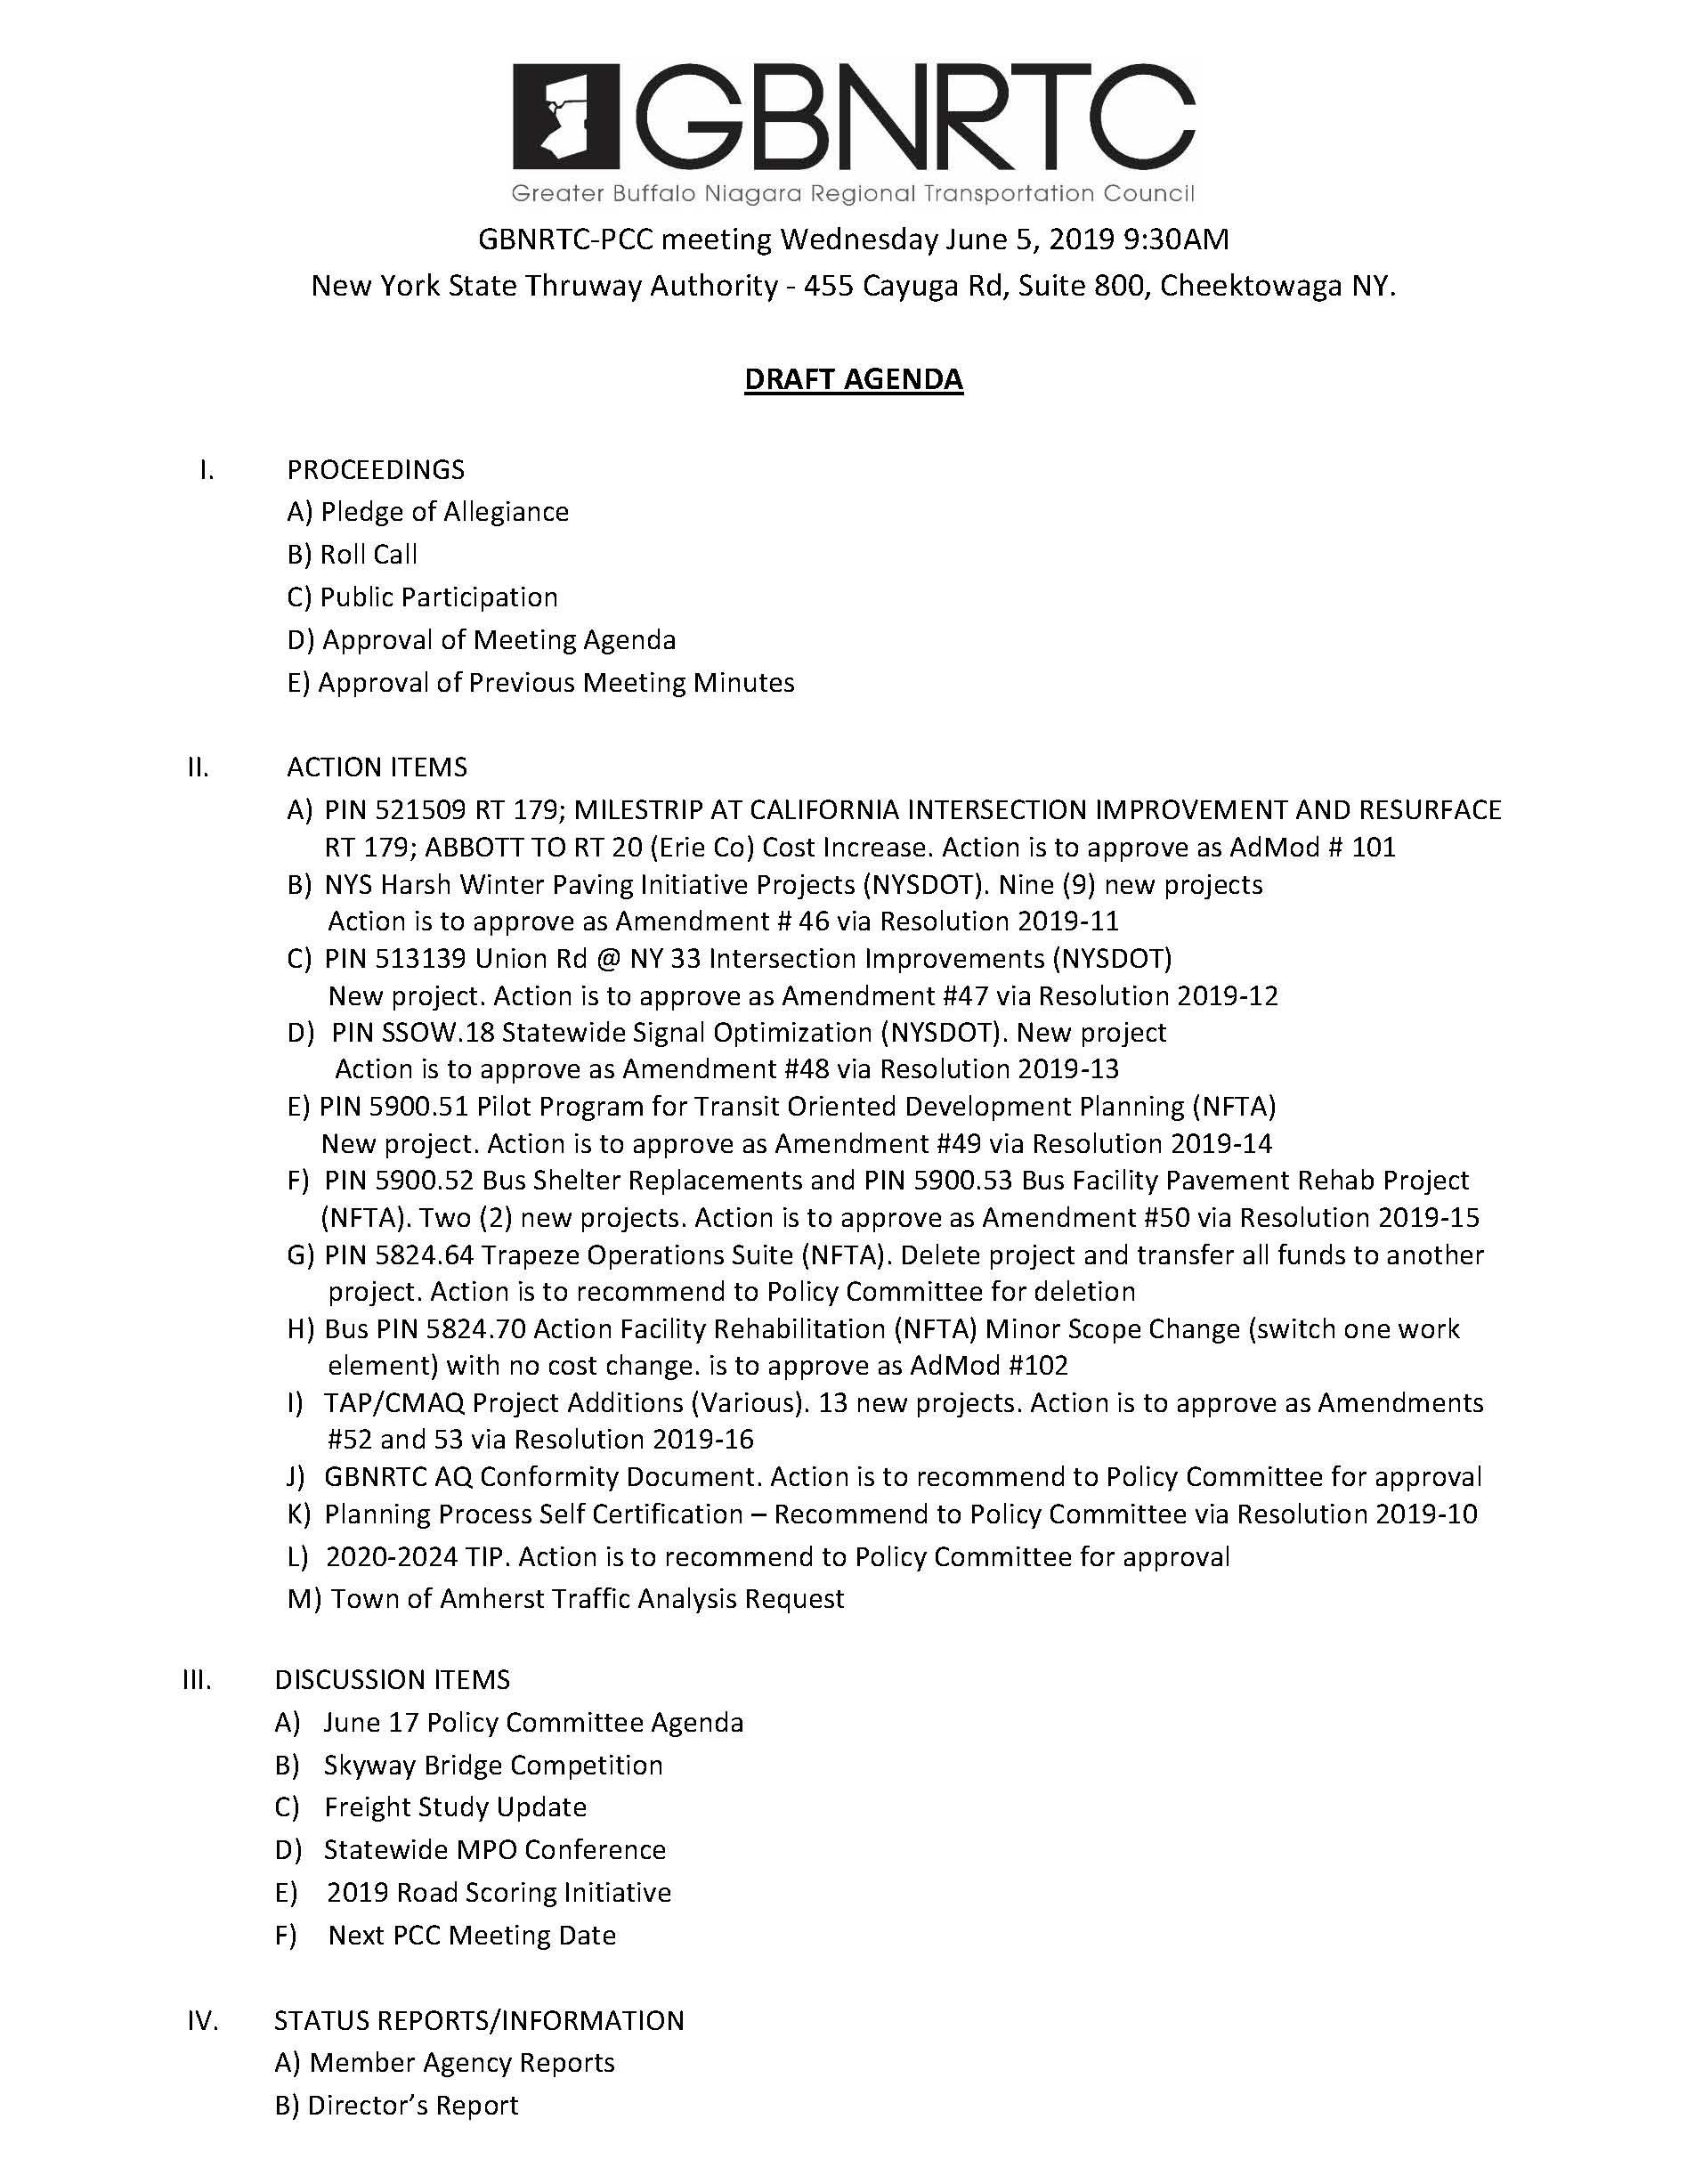 PCC Agenda-6-5-2019.jpg